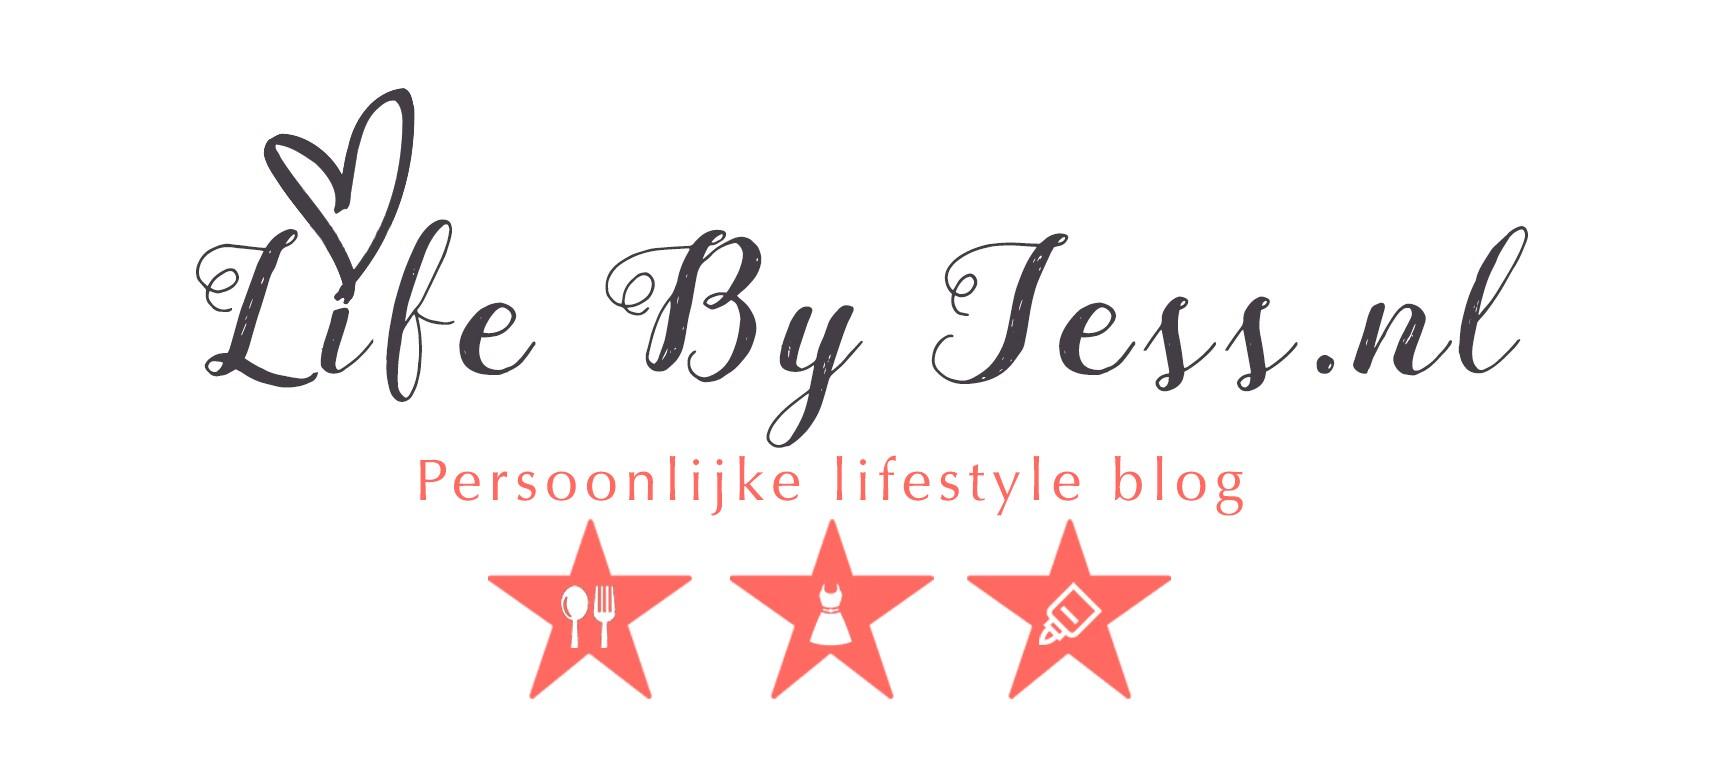 Life by Jess | Persoonlijke Lifestyle blog